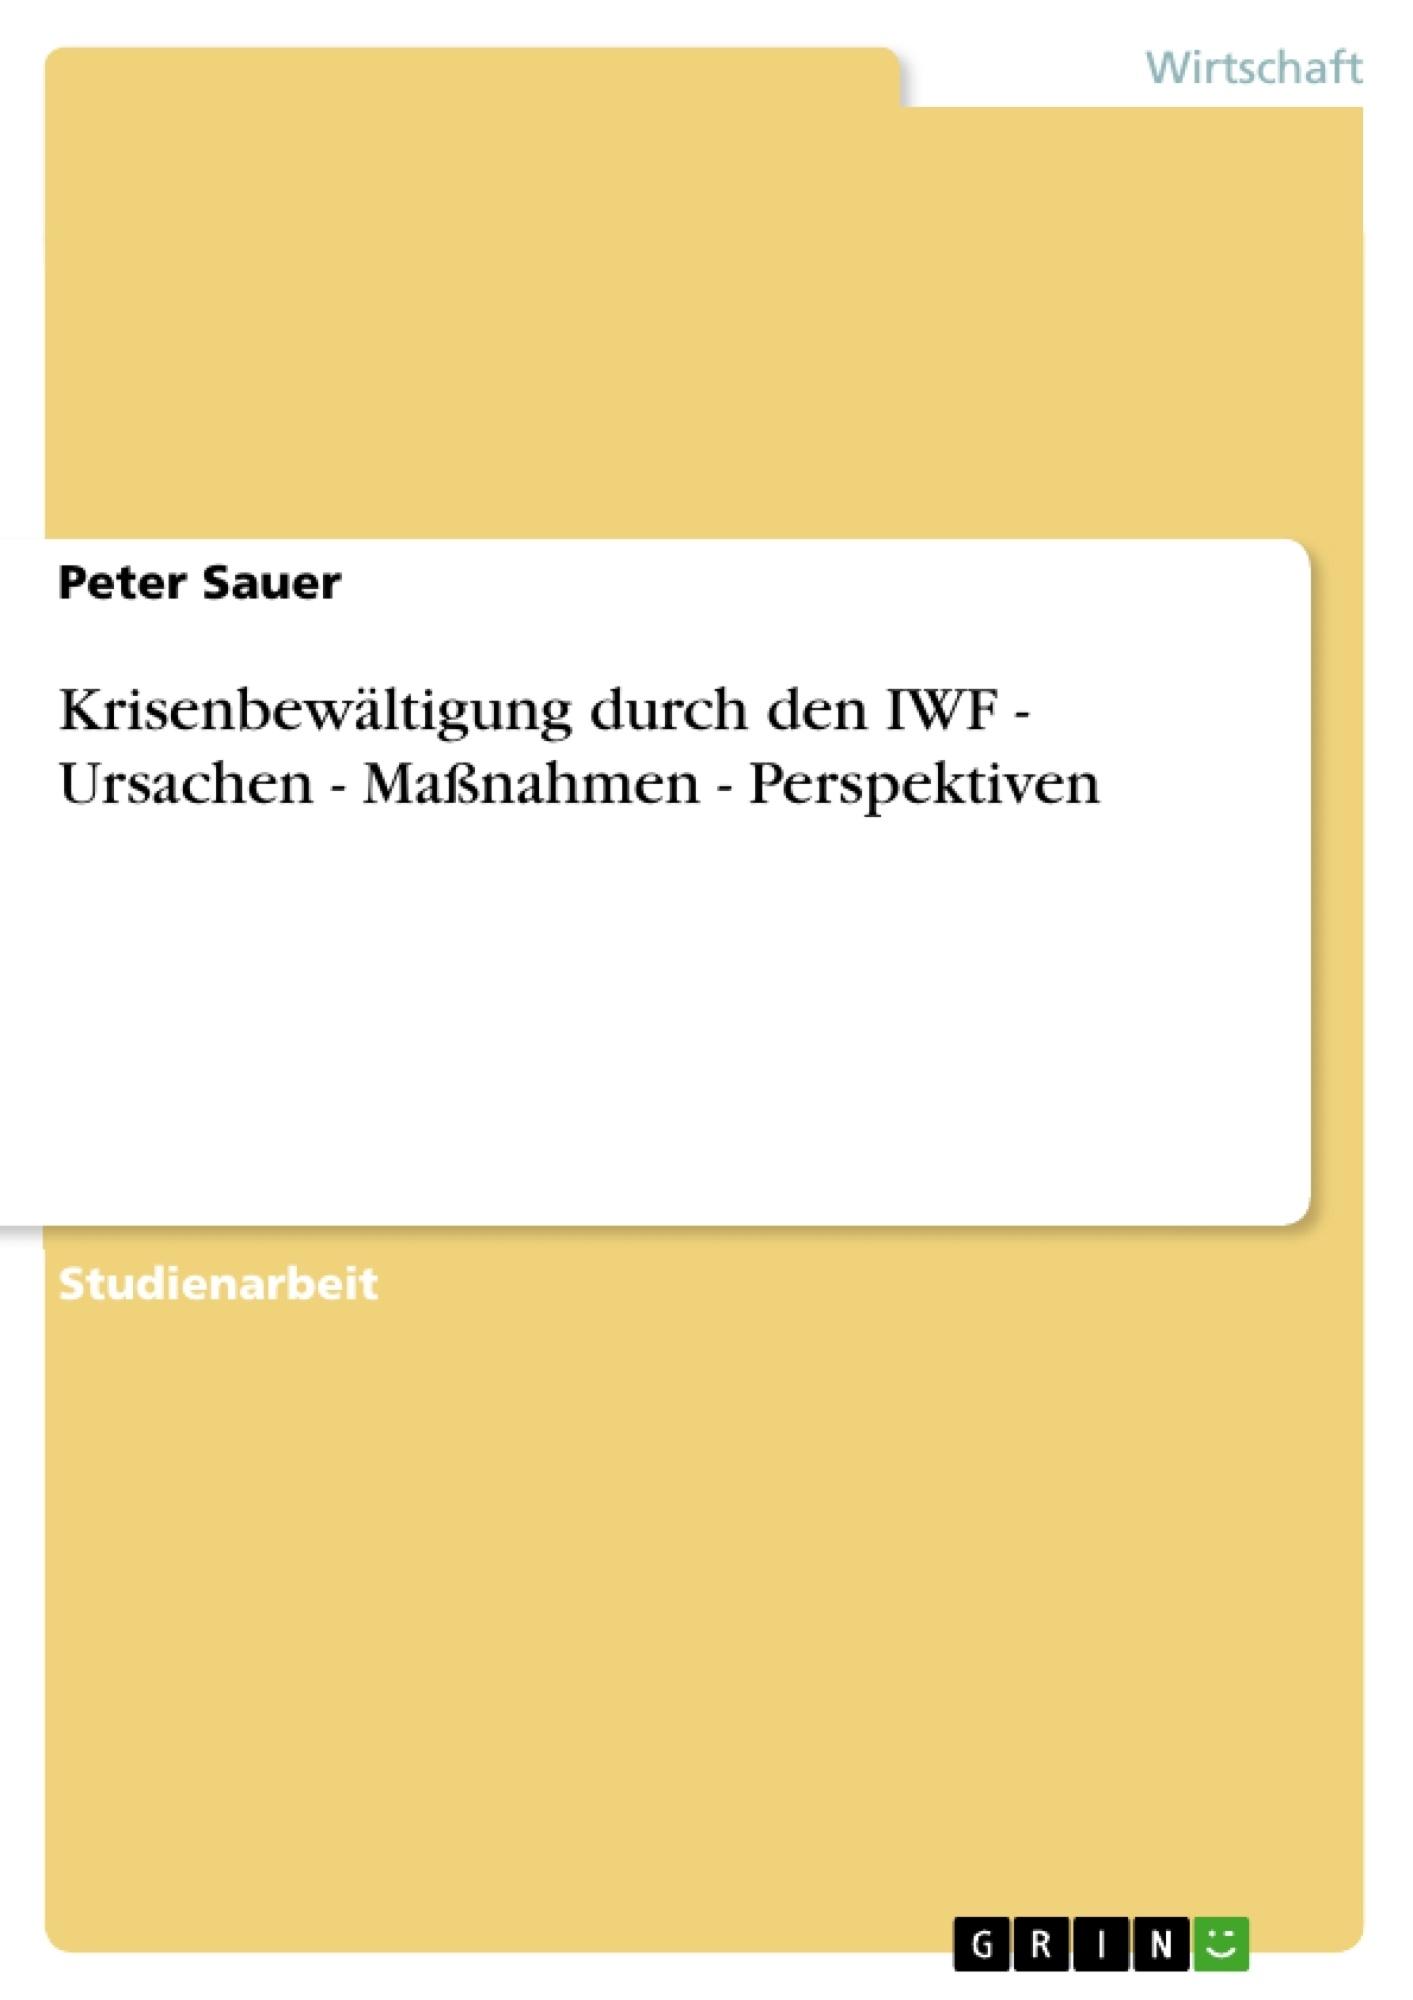 Titel: Krisenbewältigung durch den IWF - Ursachen - Maßnahmen -  Perspektiven